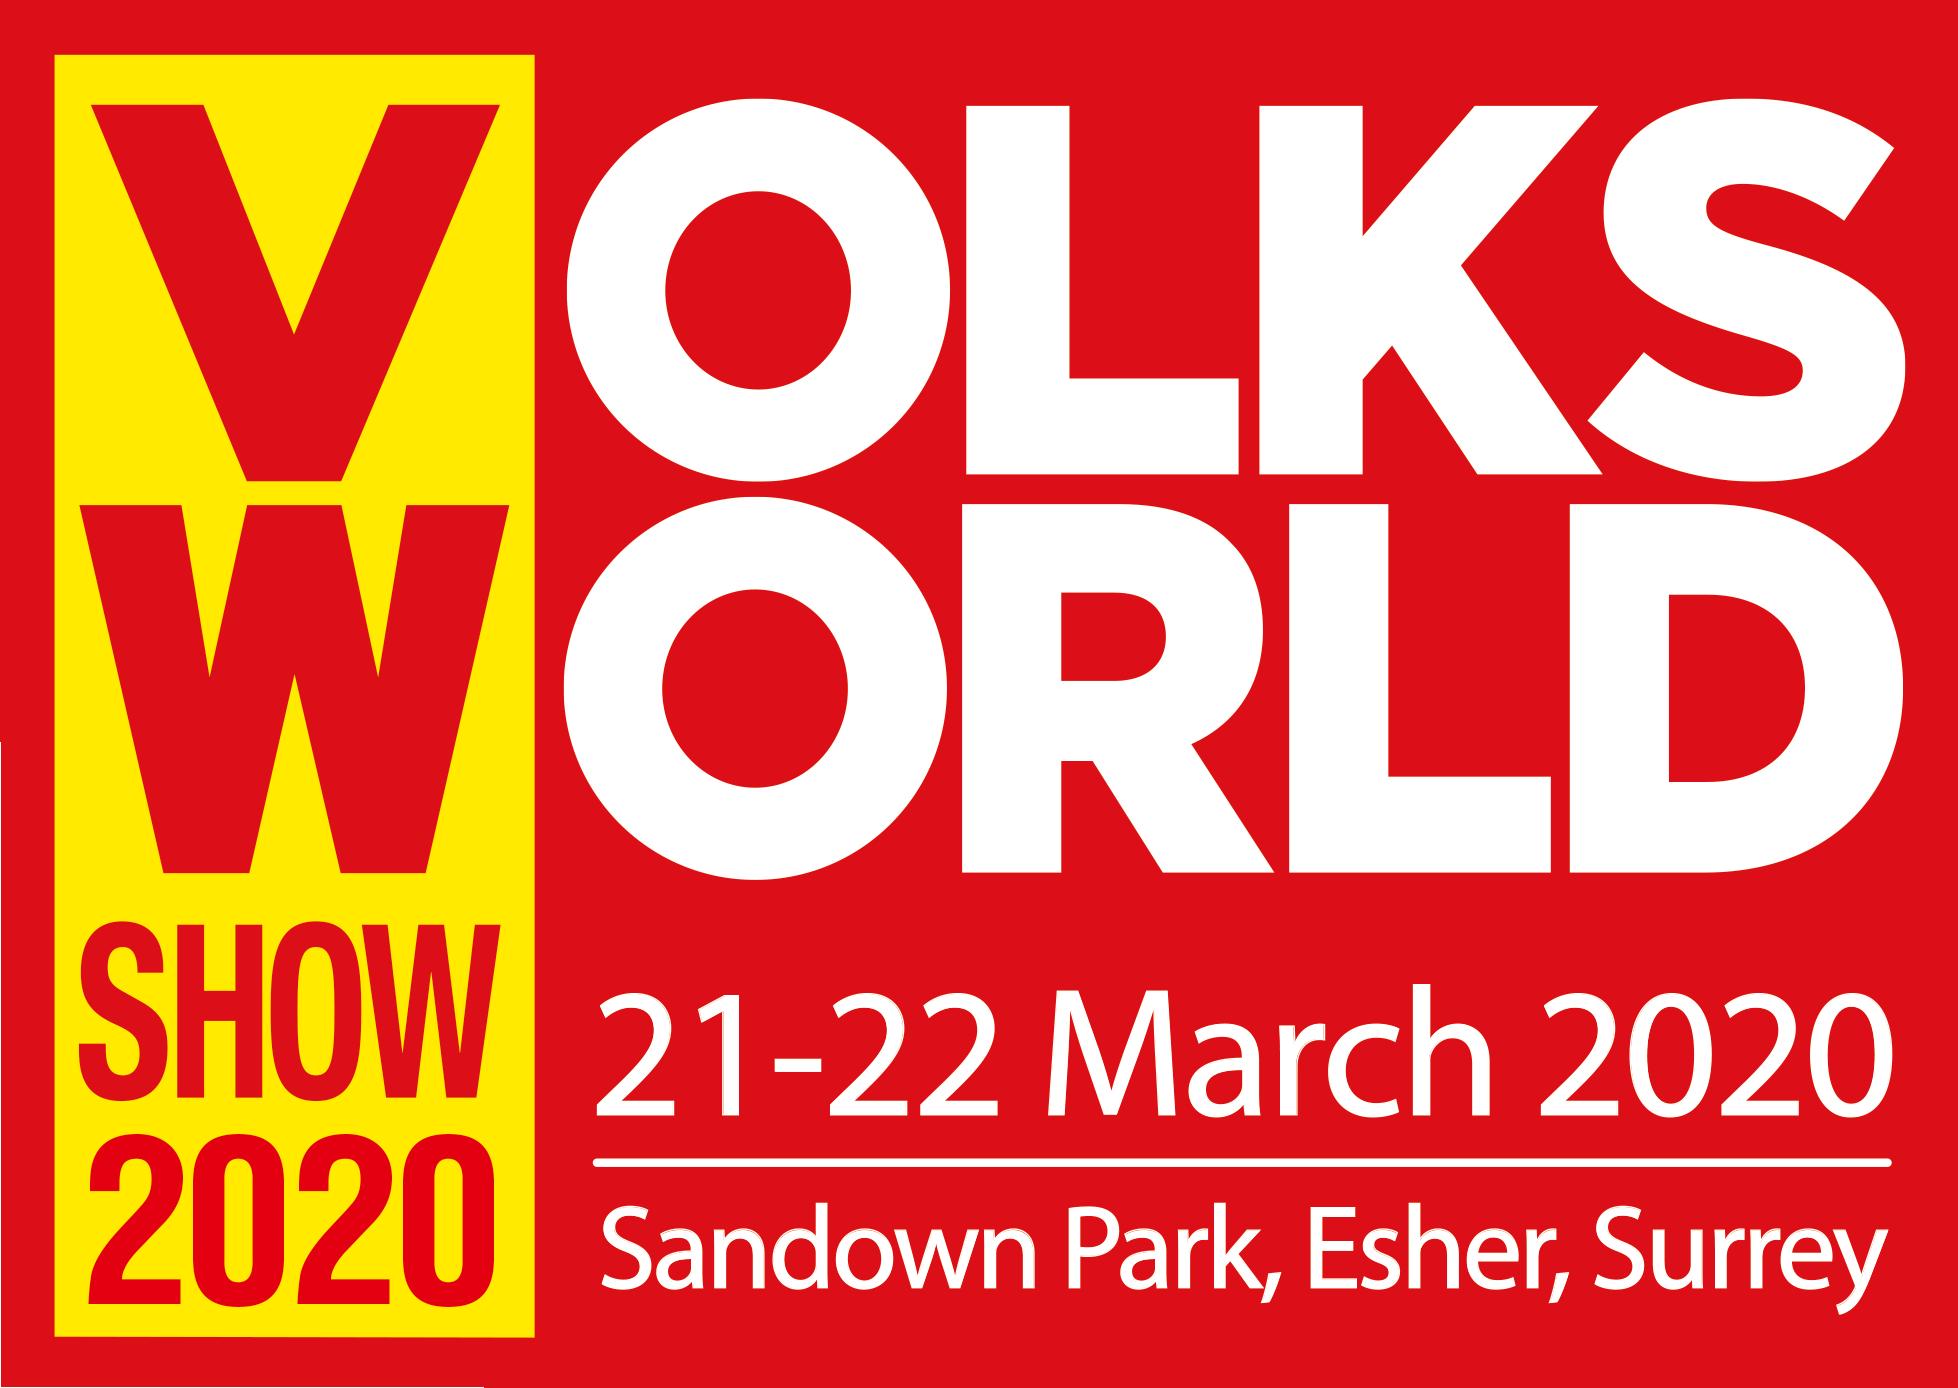 Volksworld Show 2020